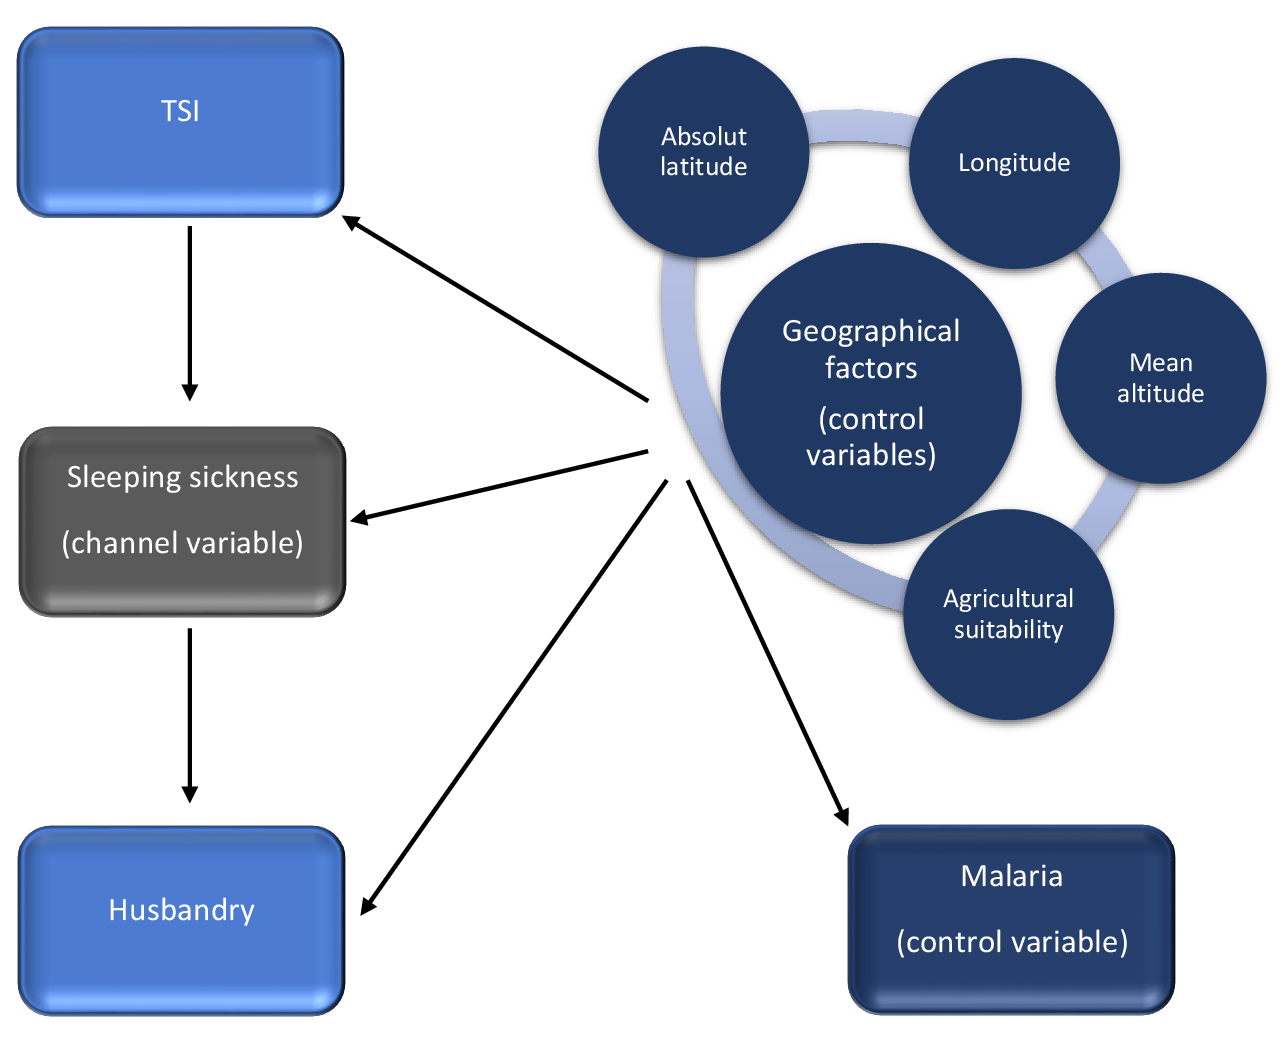 RTutor: The effect of the TseTse fly on African Development